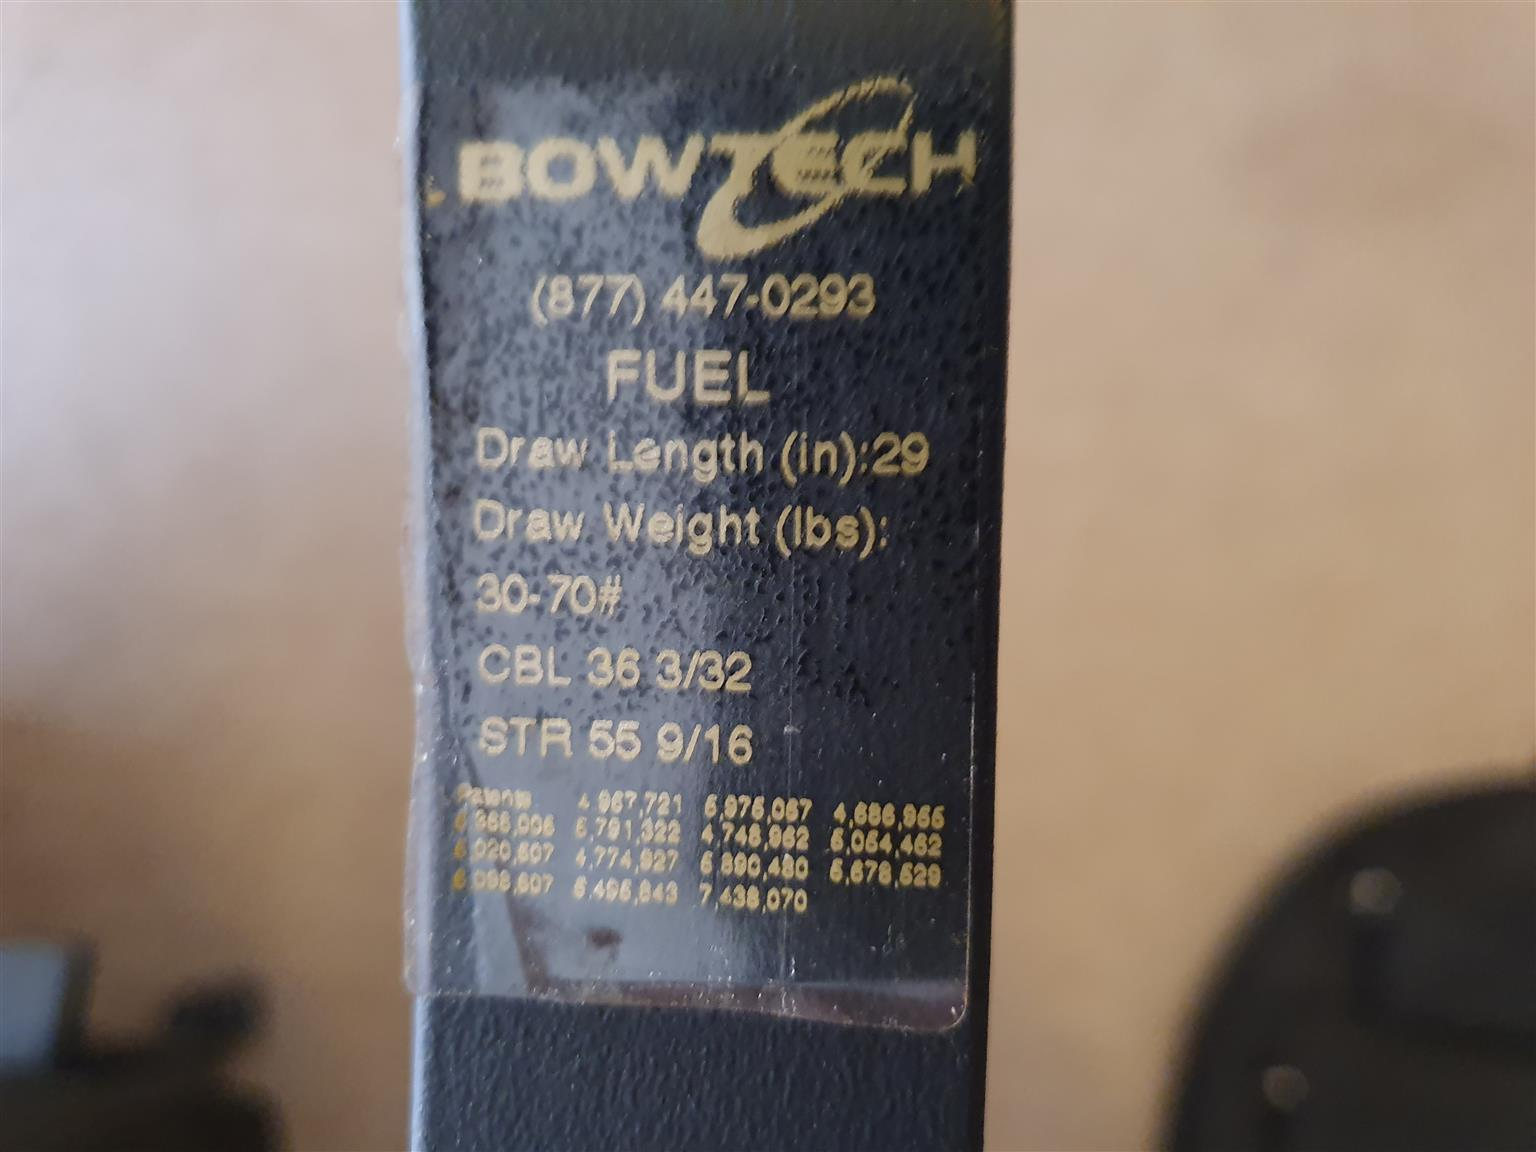 Bowtech Fuel + Rangefinder for sale